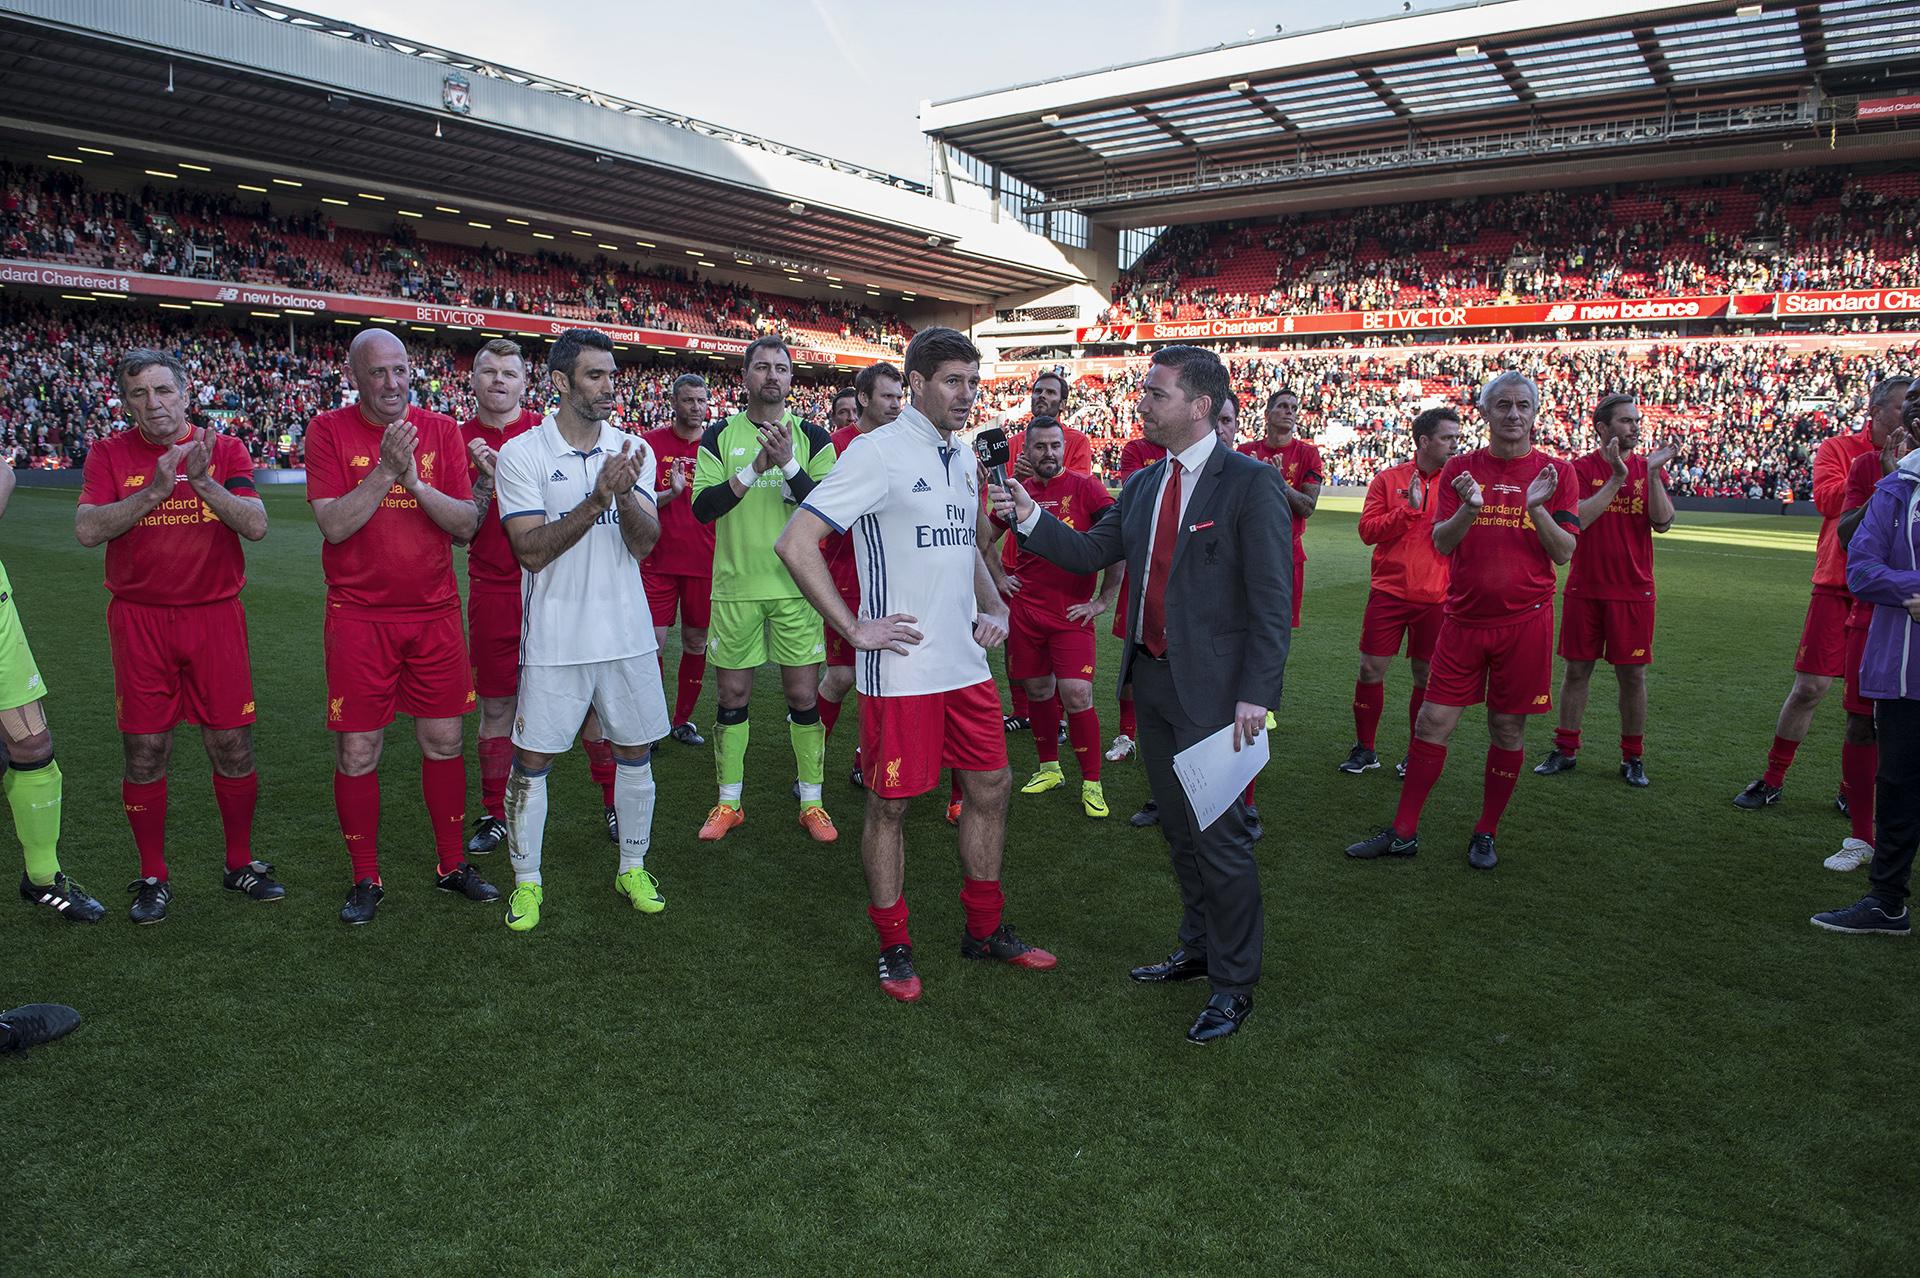 Steven Gerrard LFC Foundation x Nivea Men Liverpool Legenda vs Real Mardrid Legends.jpg